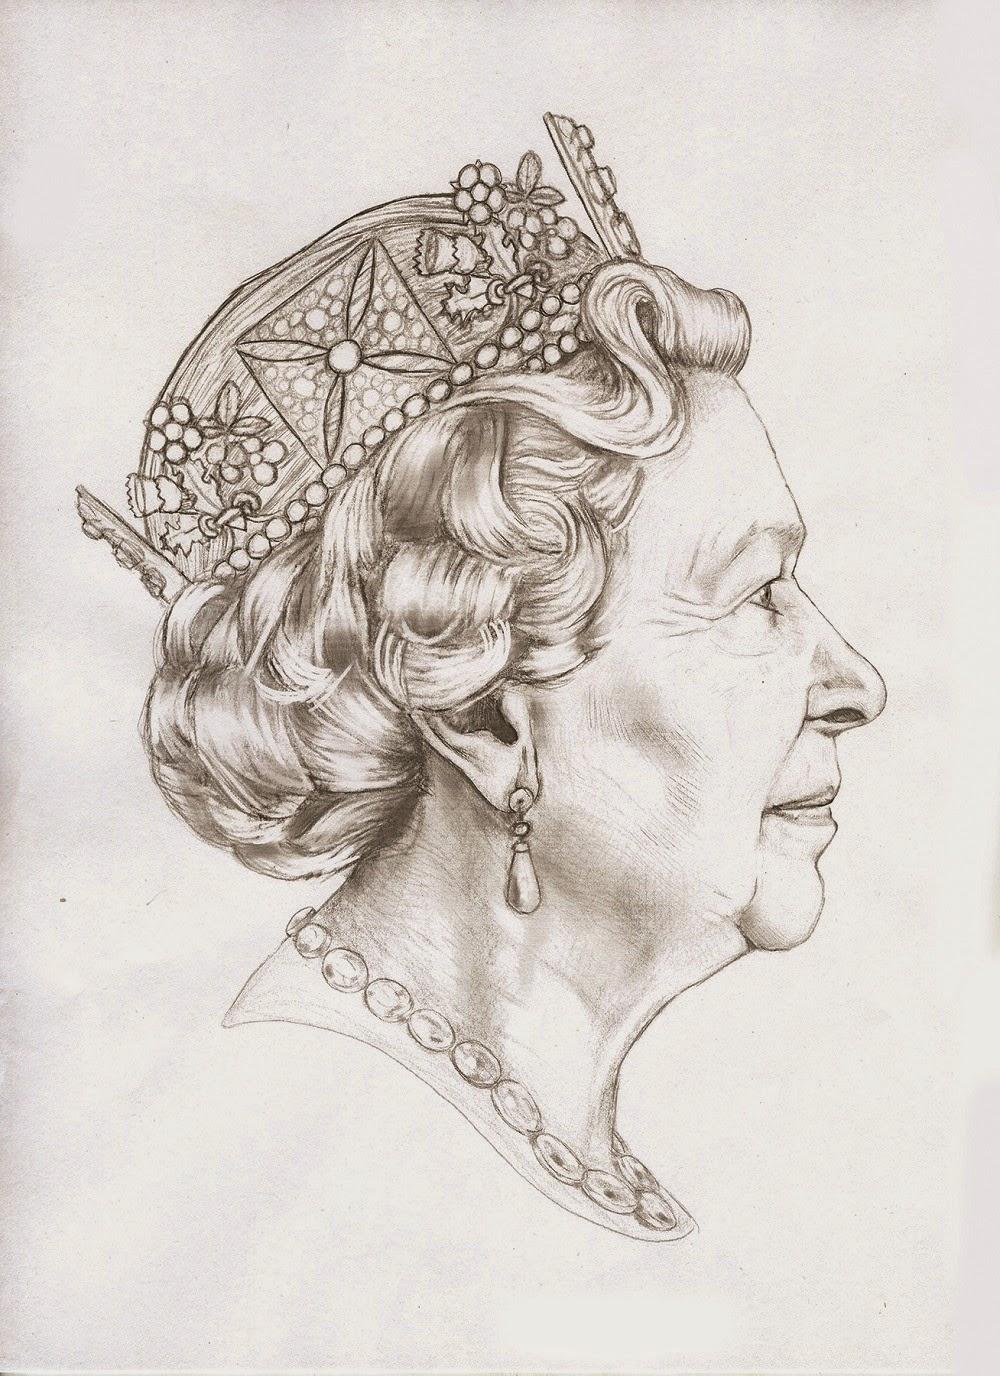 Sketch for Queen Elizabeth's fifth coin portrait